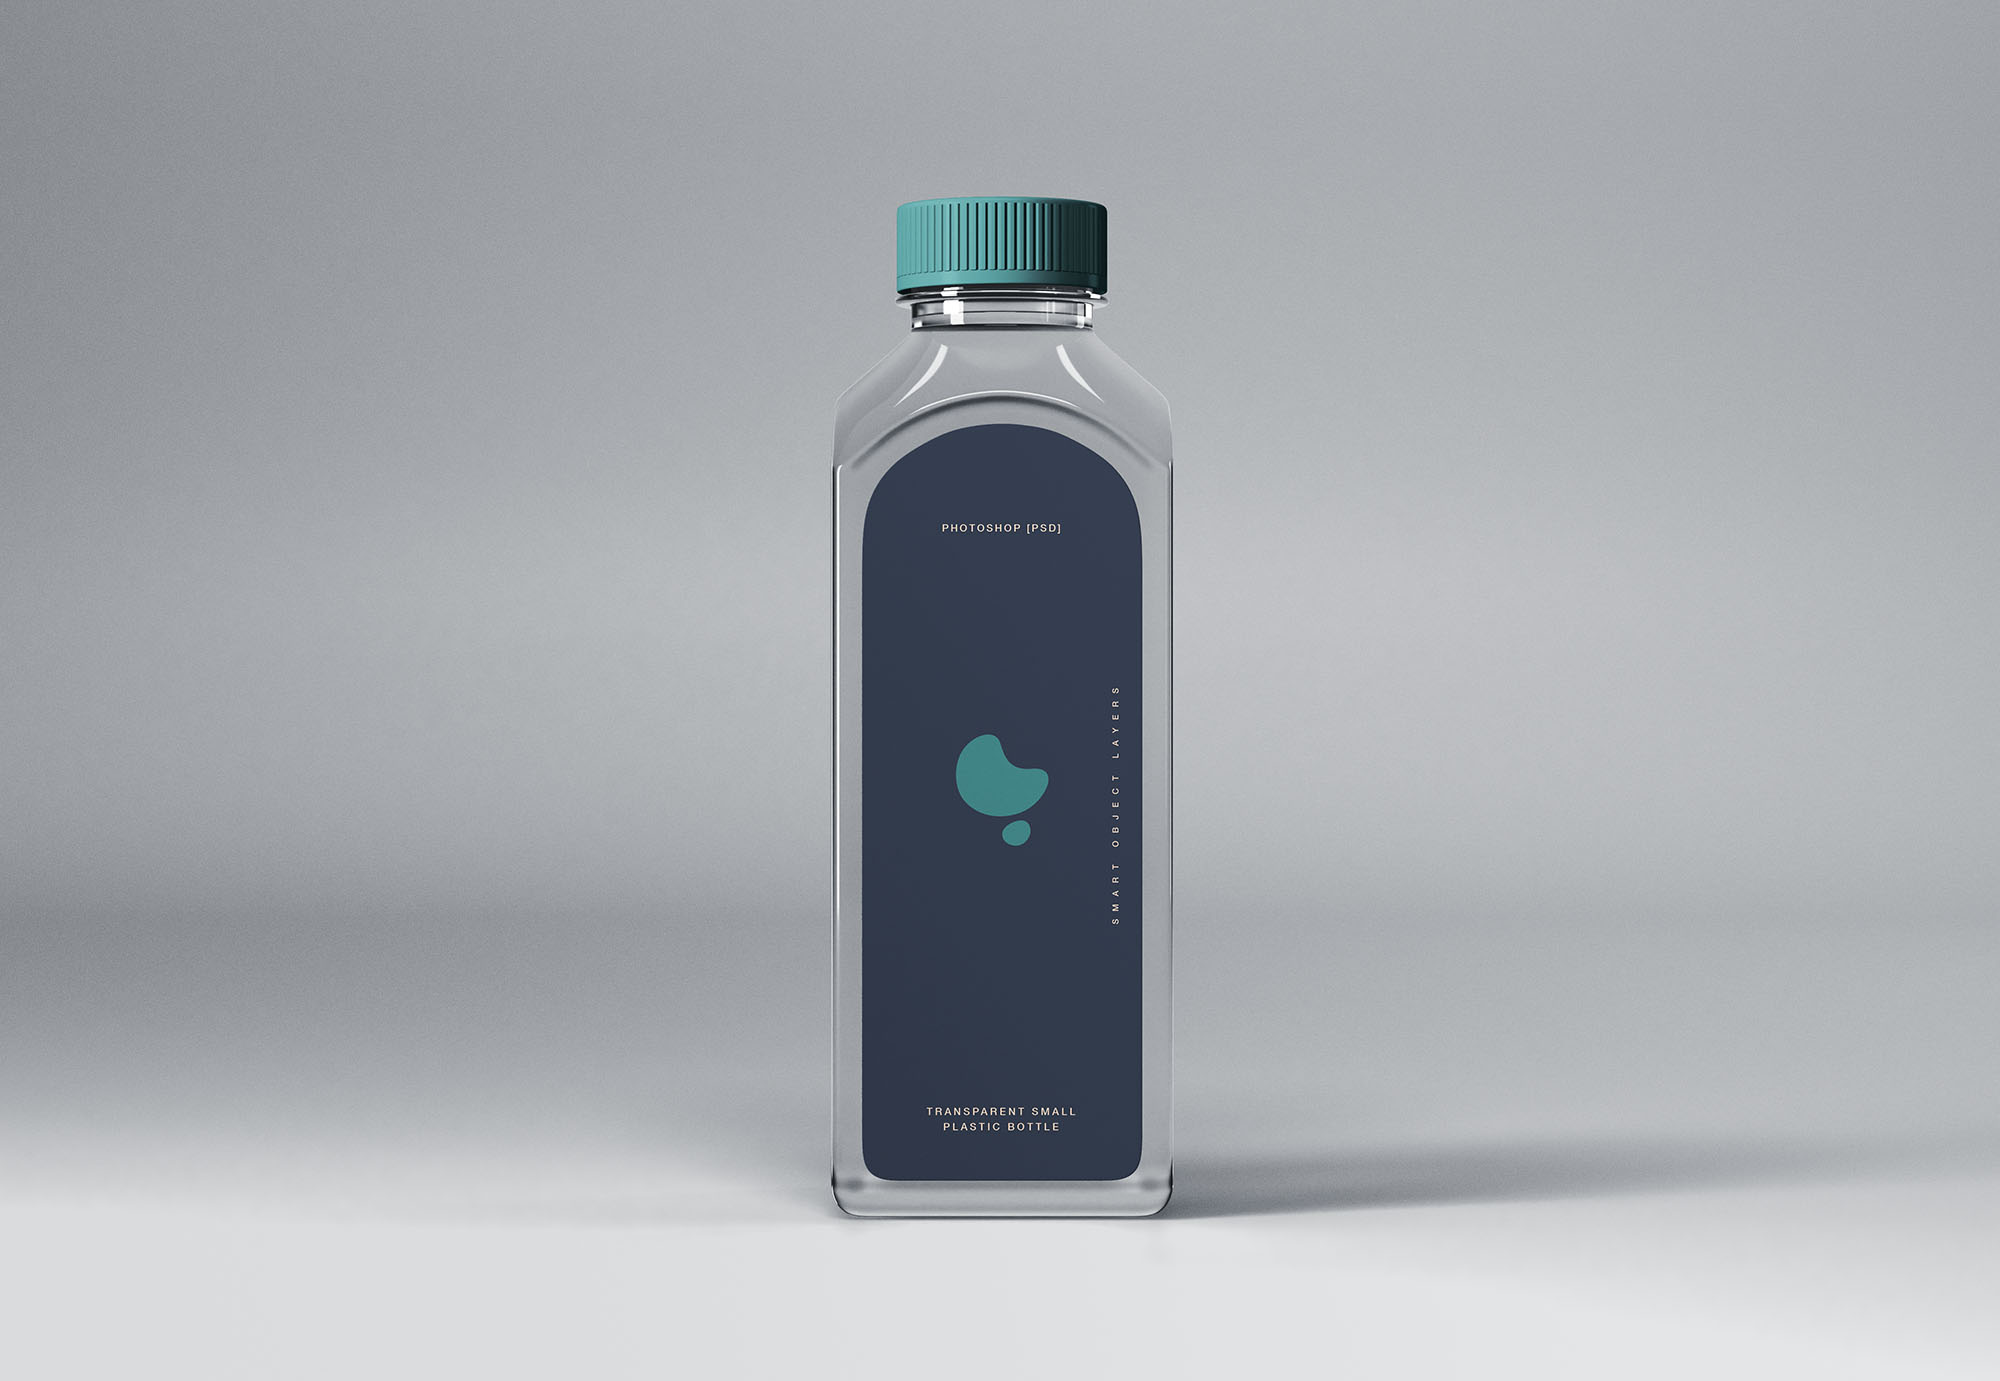 Transparent Small Plastic Bottle Mockup